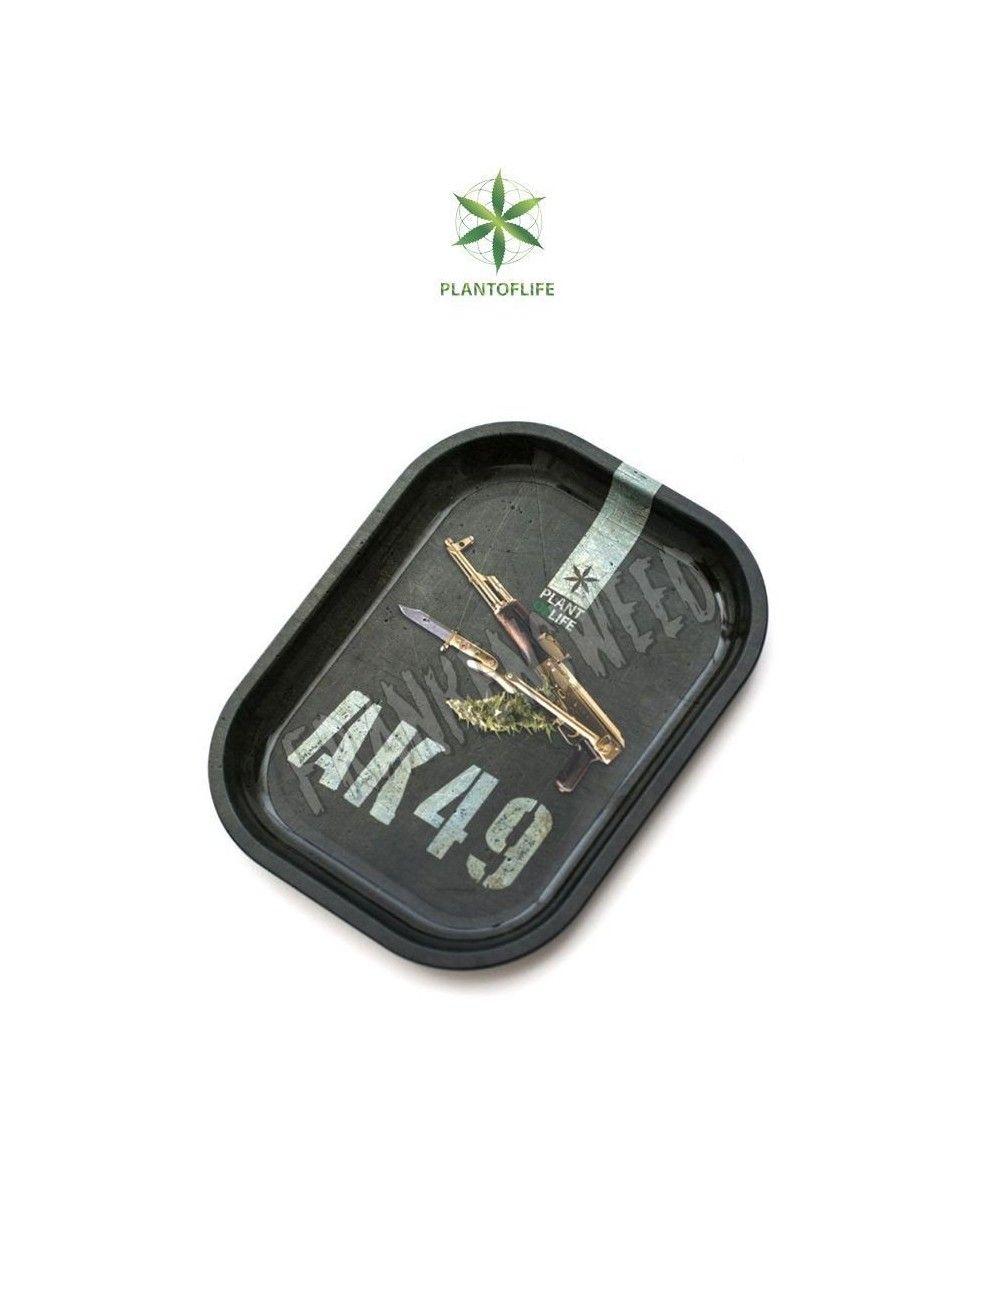 Bandeja Plant of Life AK49 Mini